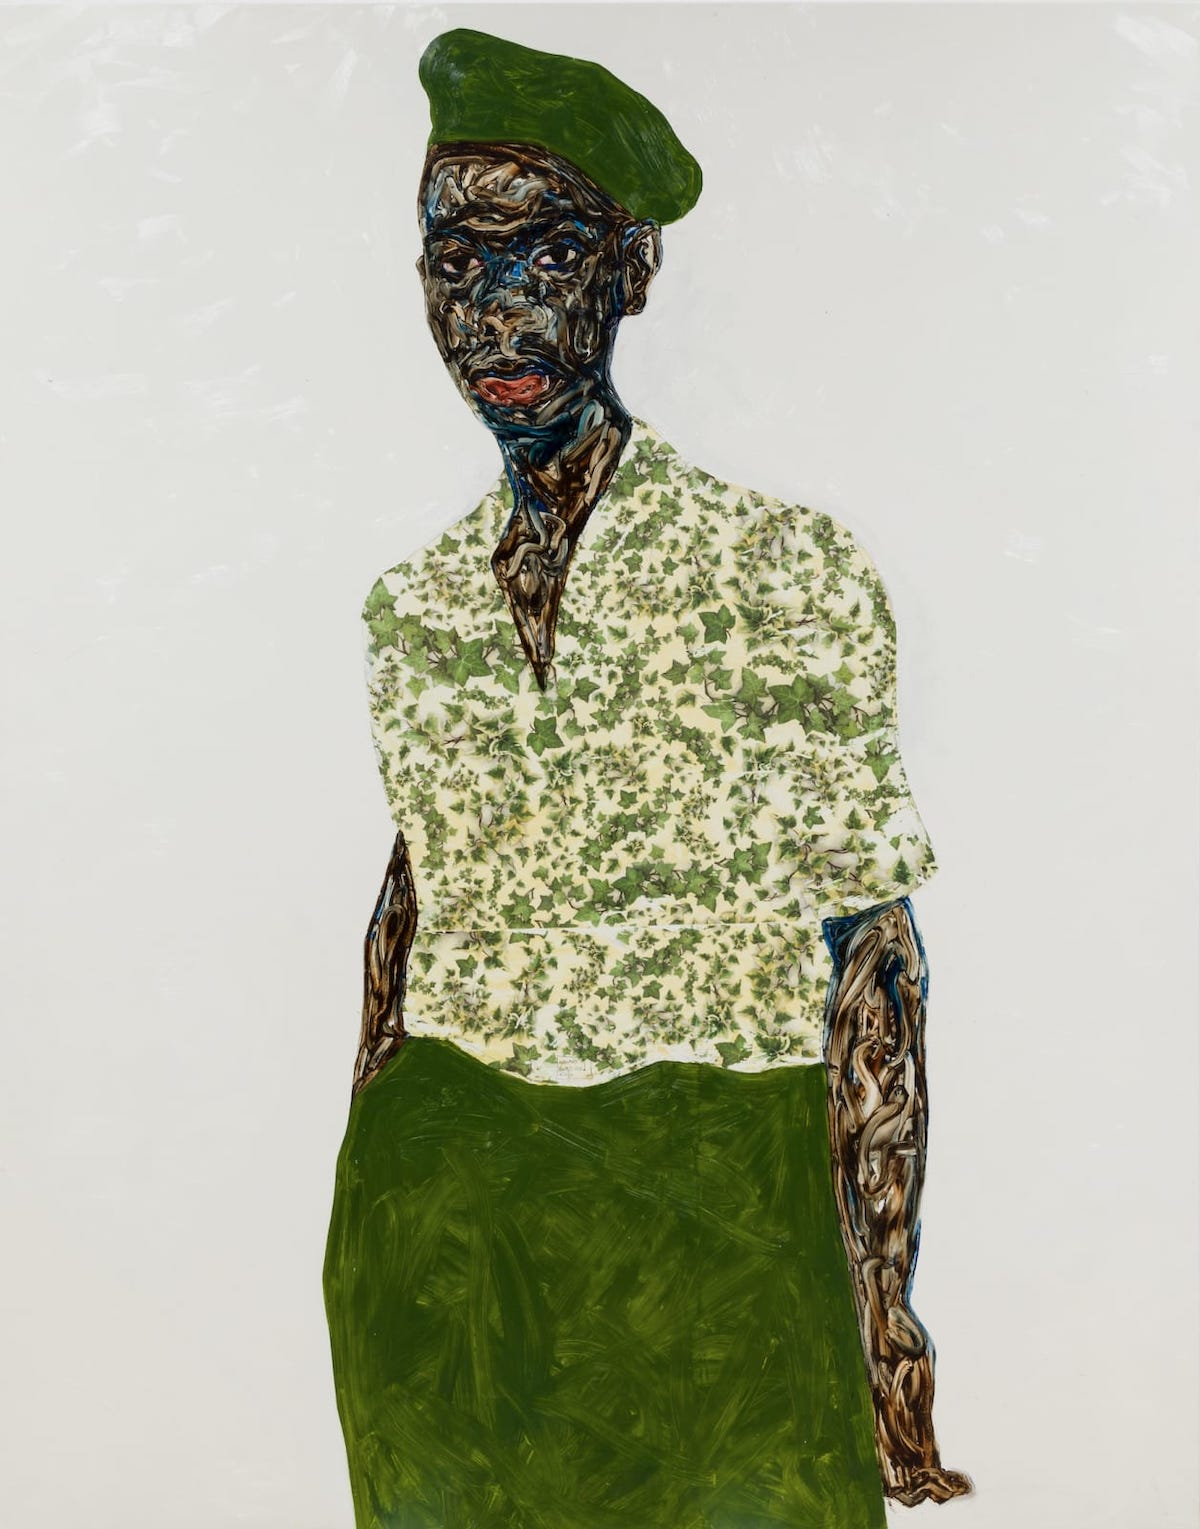 amoako-boafo-green-beret-mariane-ibrahim-gallery